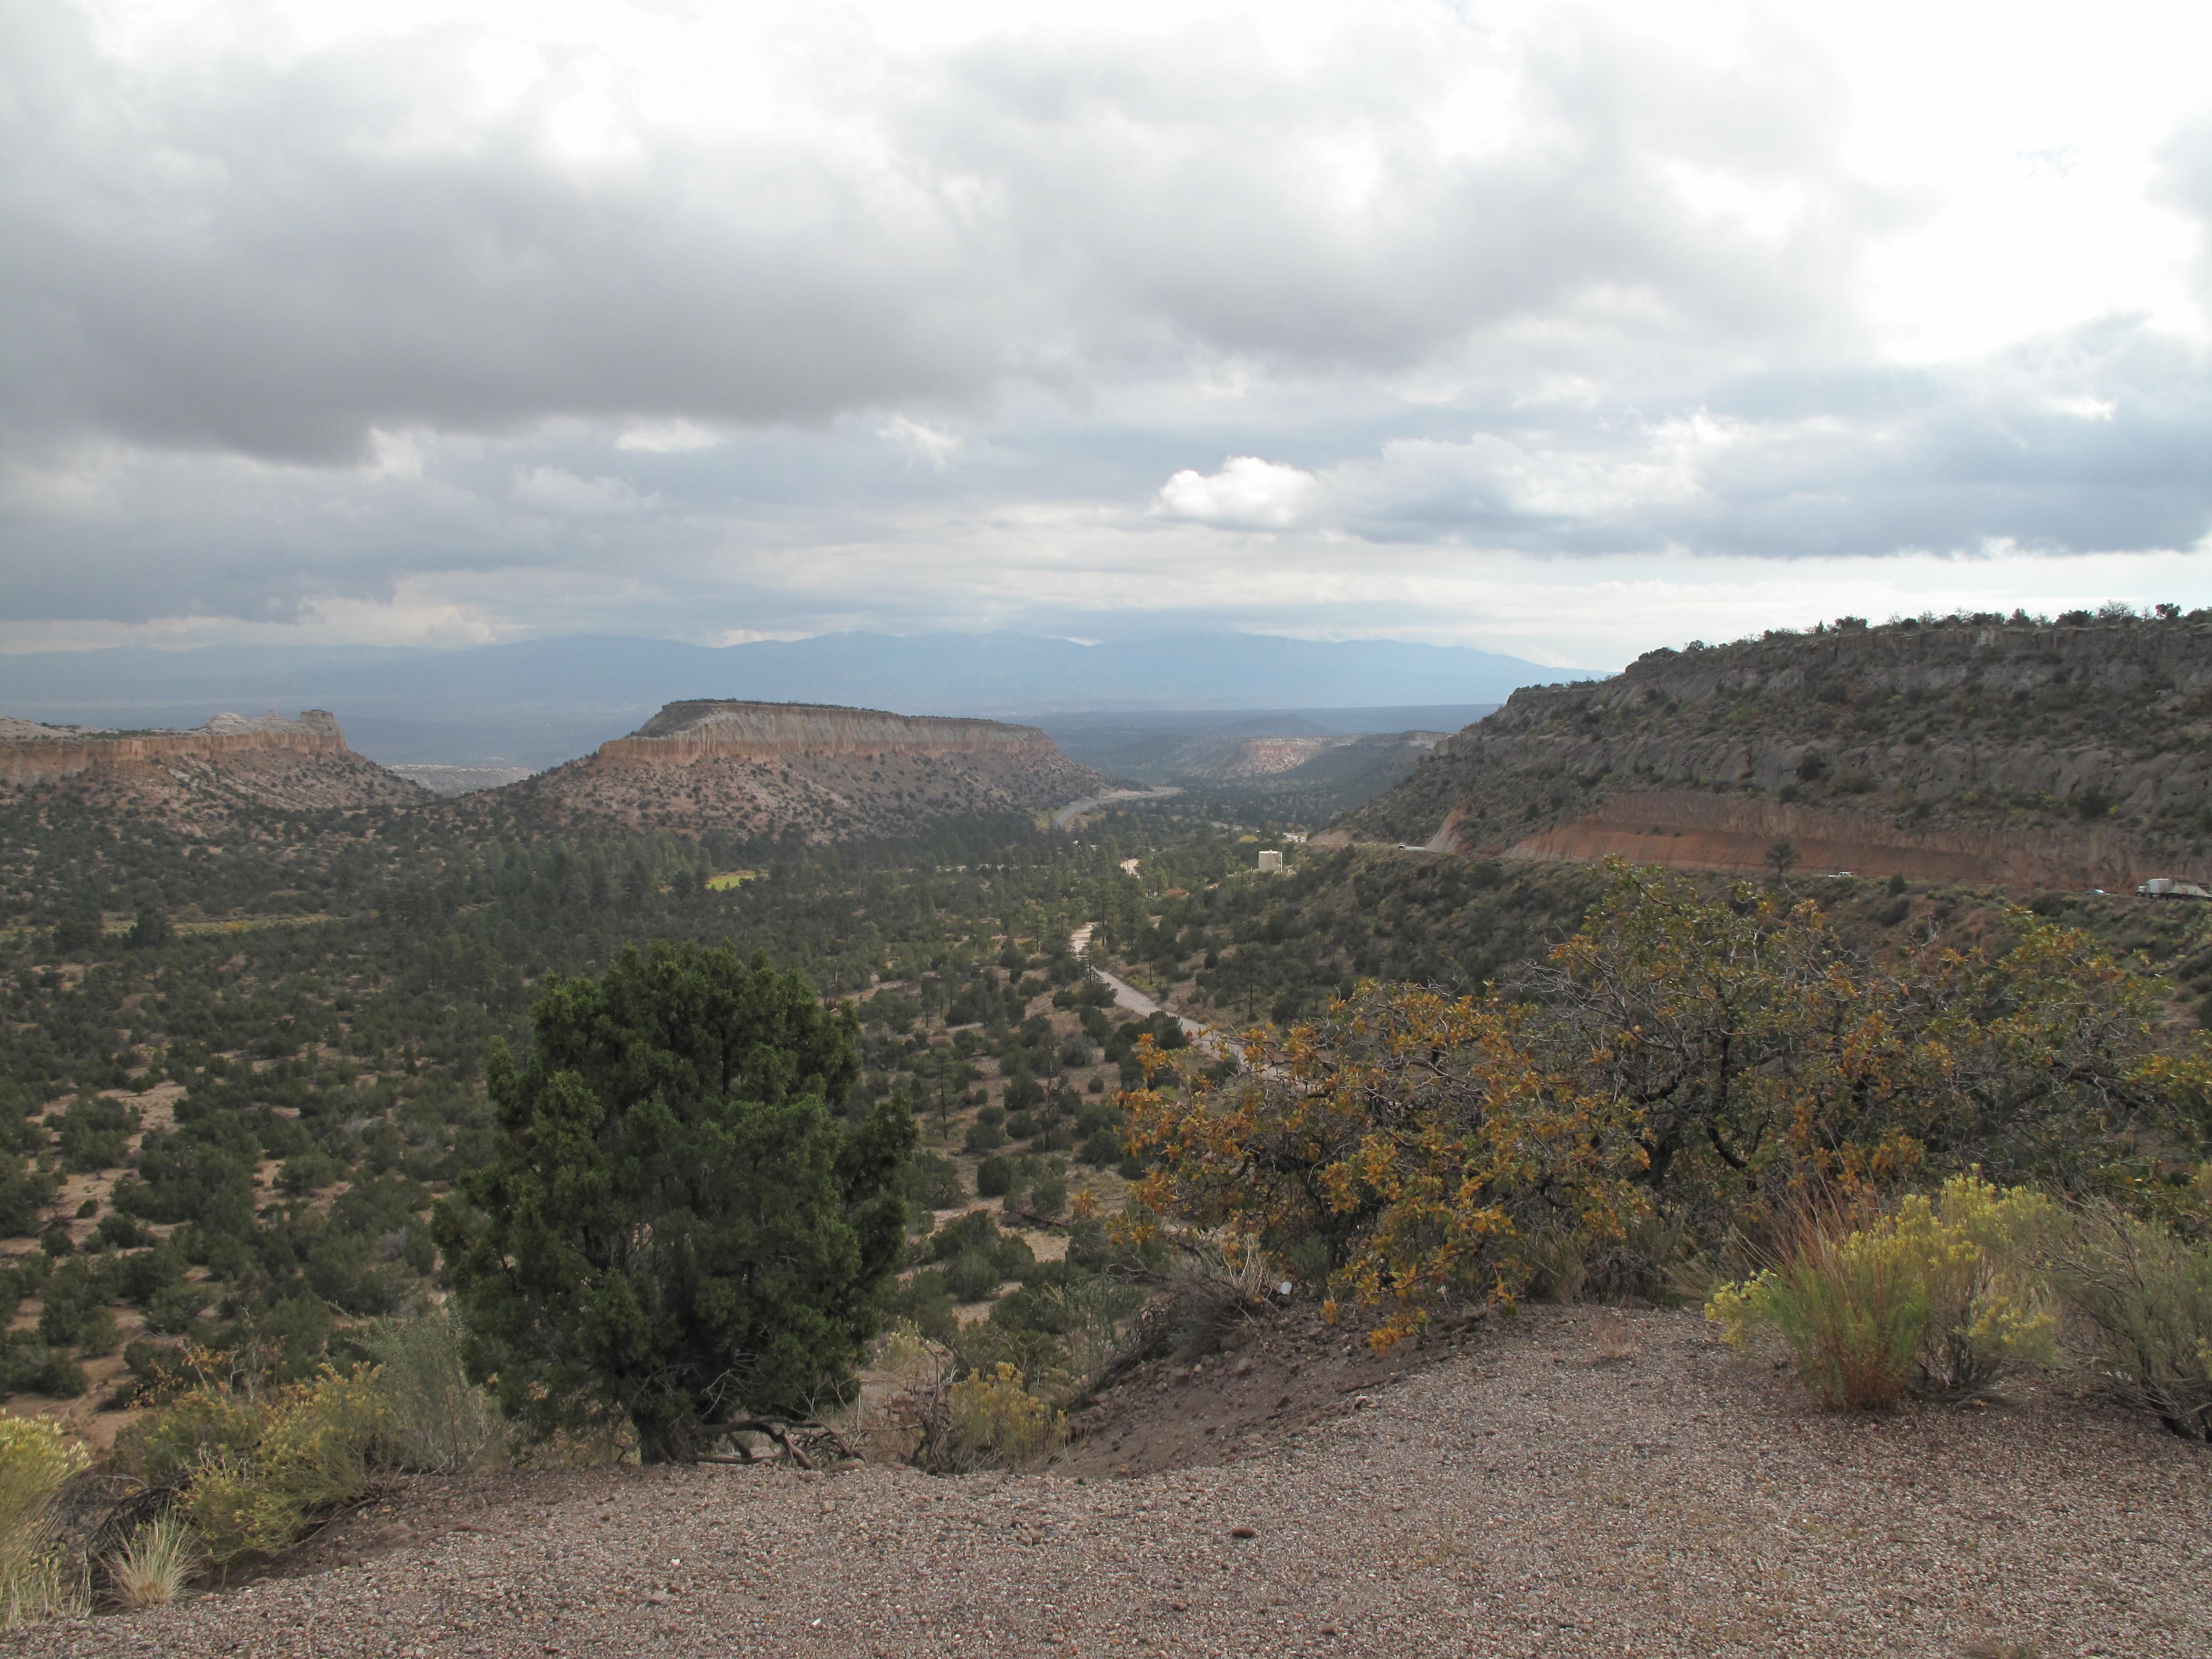 New mexico los alamos county los alamos - View Of Canyon Below Los Alamos New Mexico